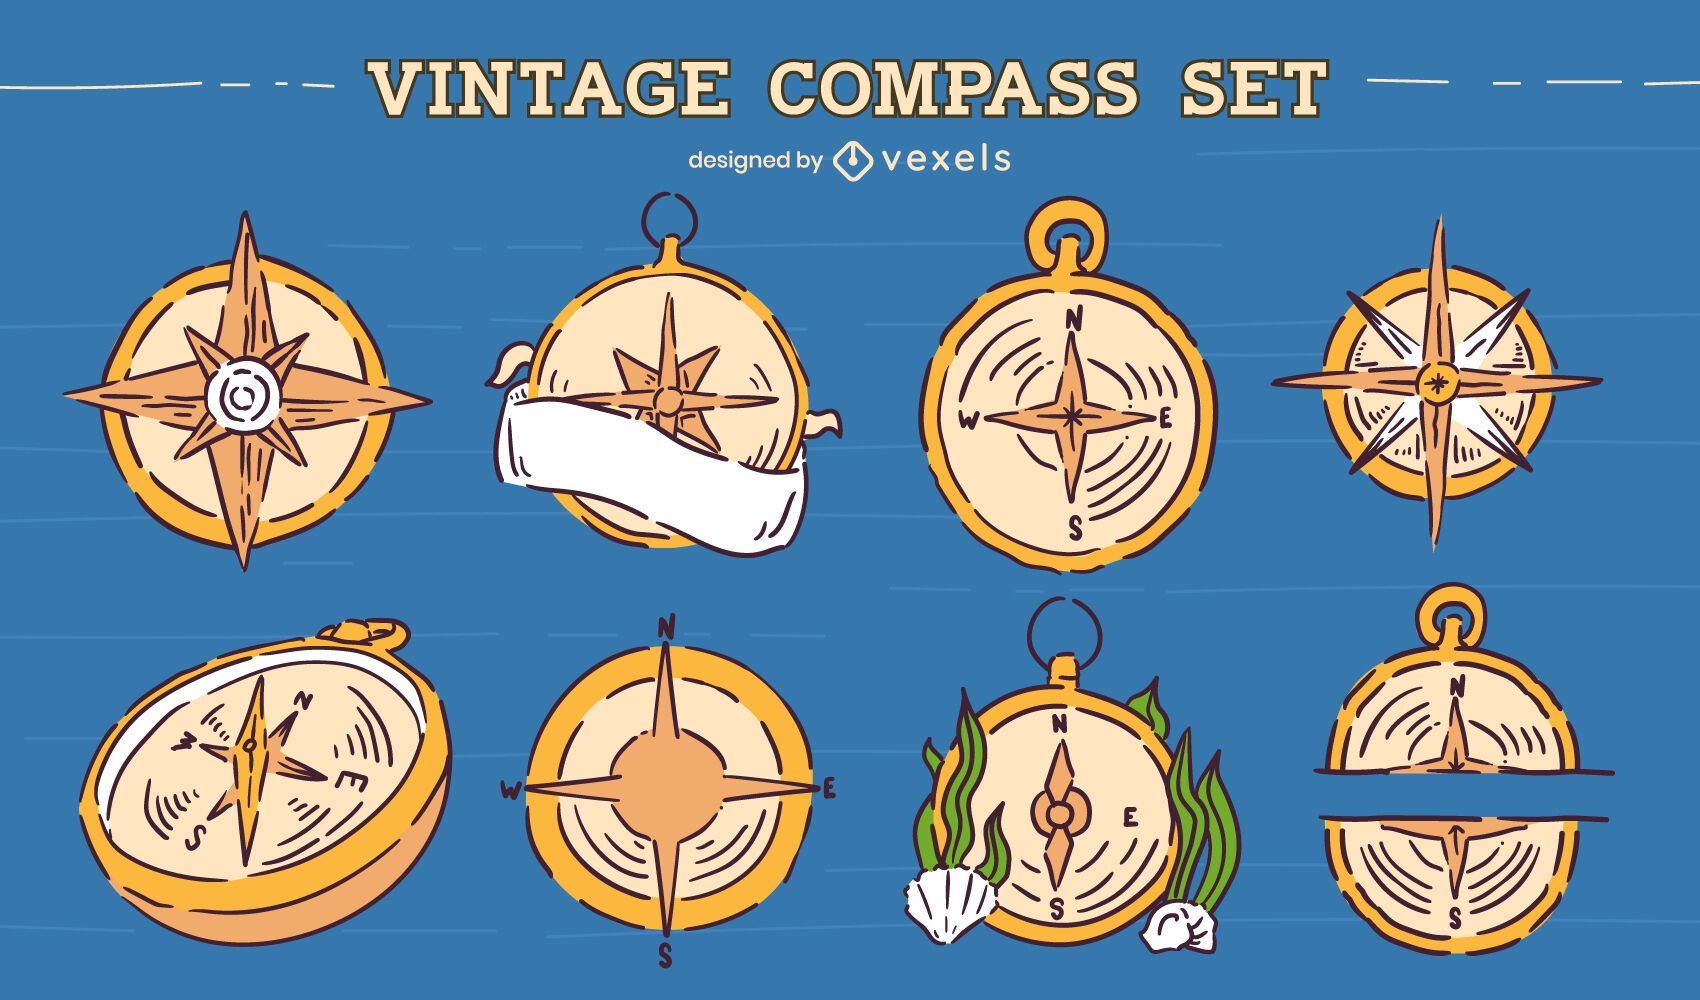 Vintage compass illustration set